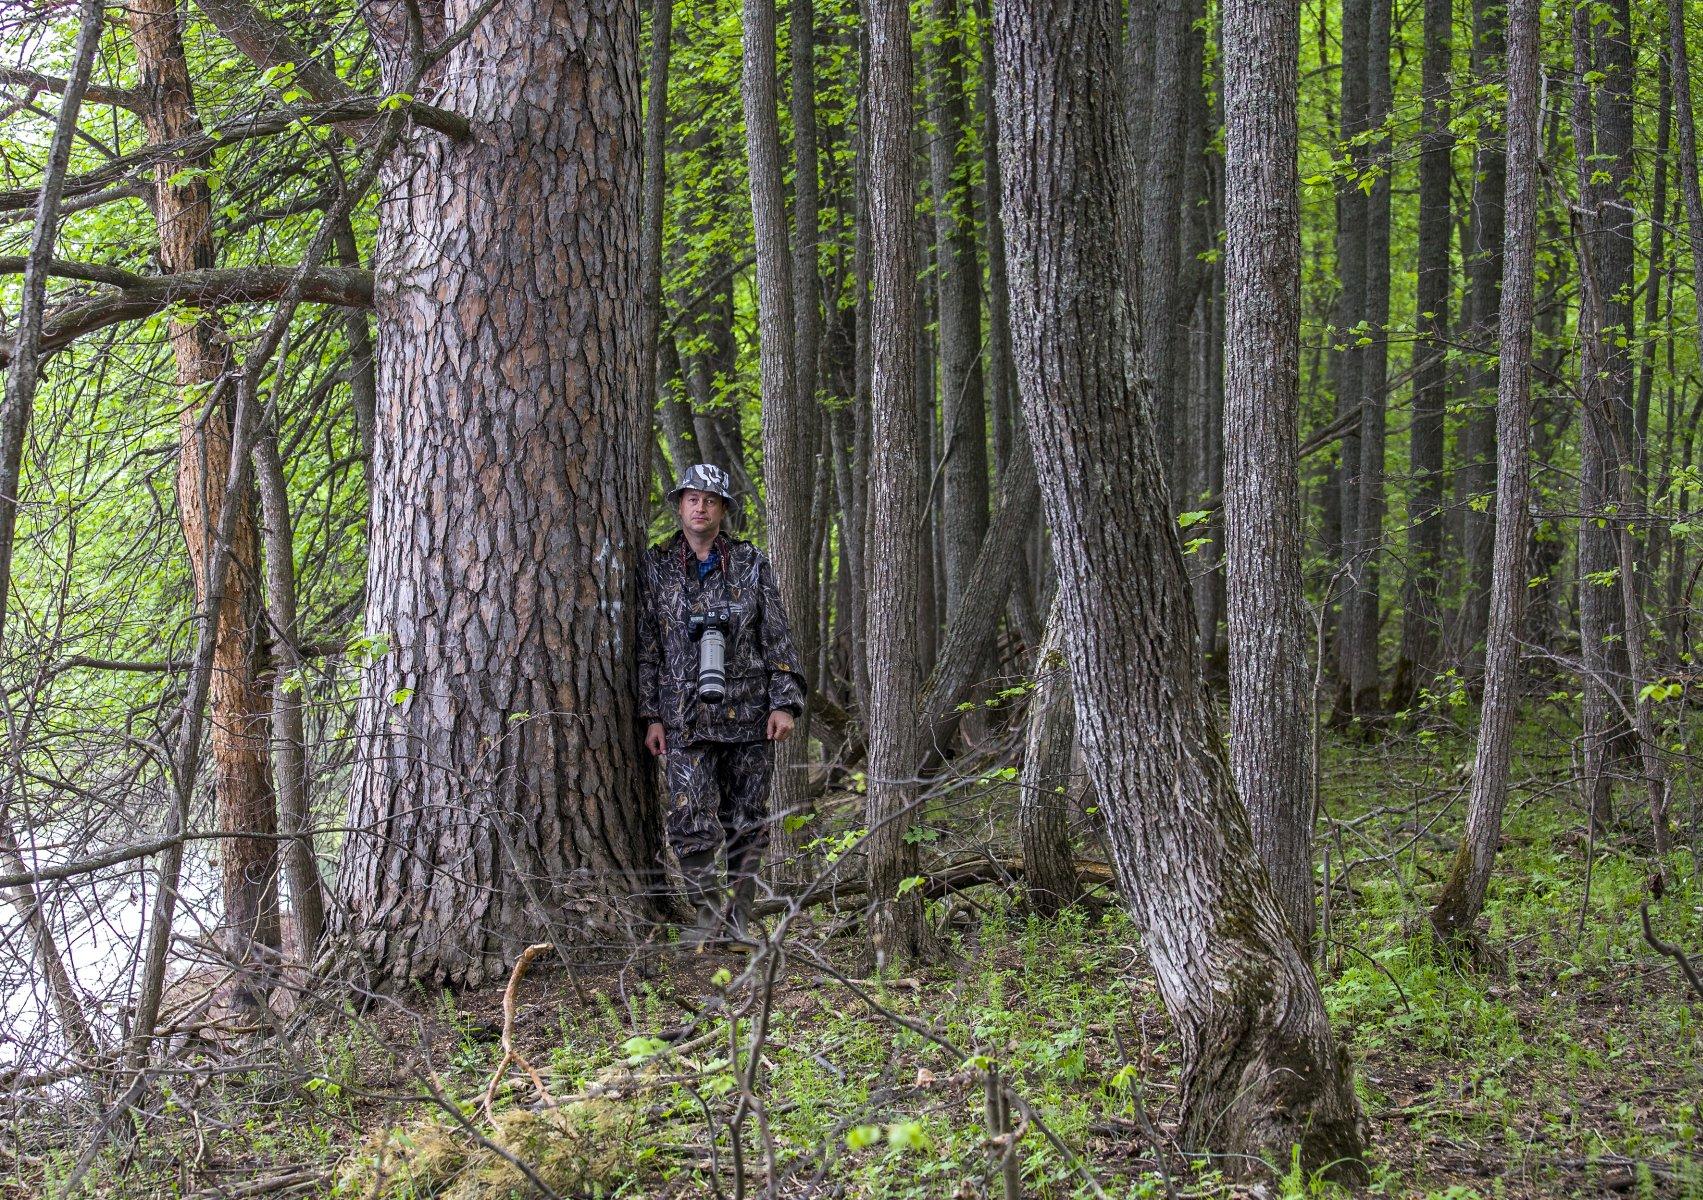 Среди деревьев. Фото А. А. Широких